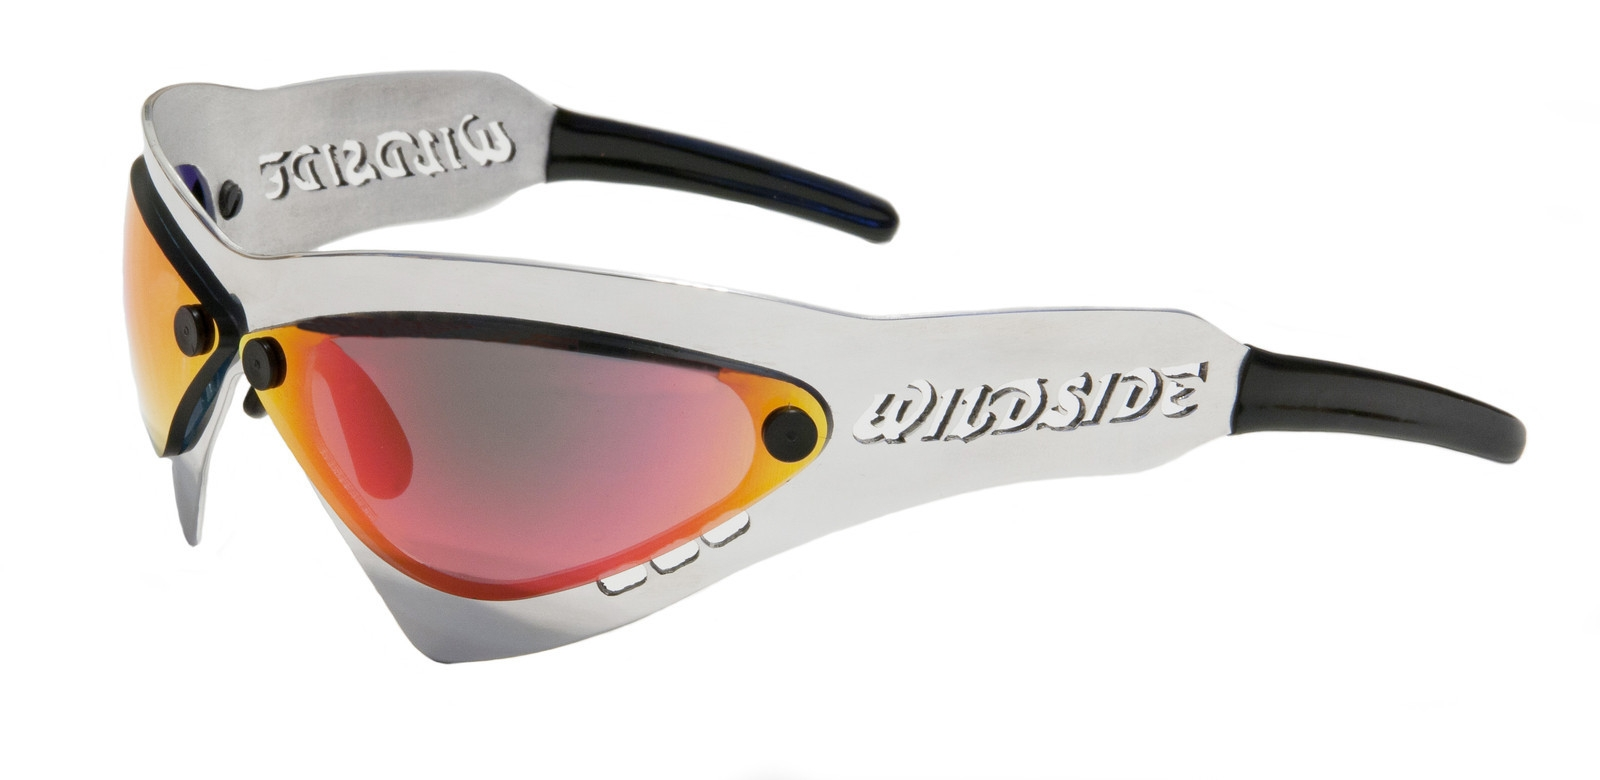 WildSide Aluminum Motorcycle Sunglasses